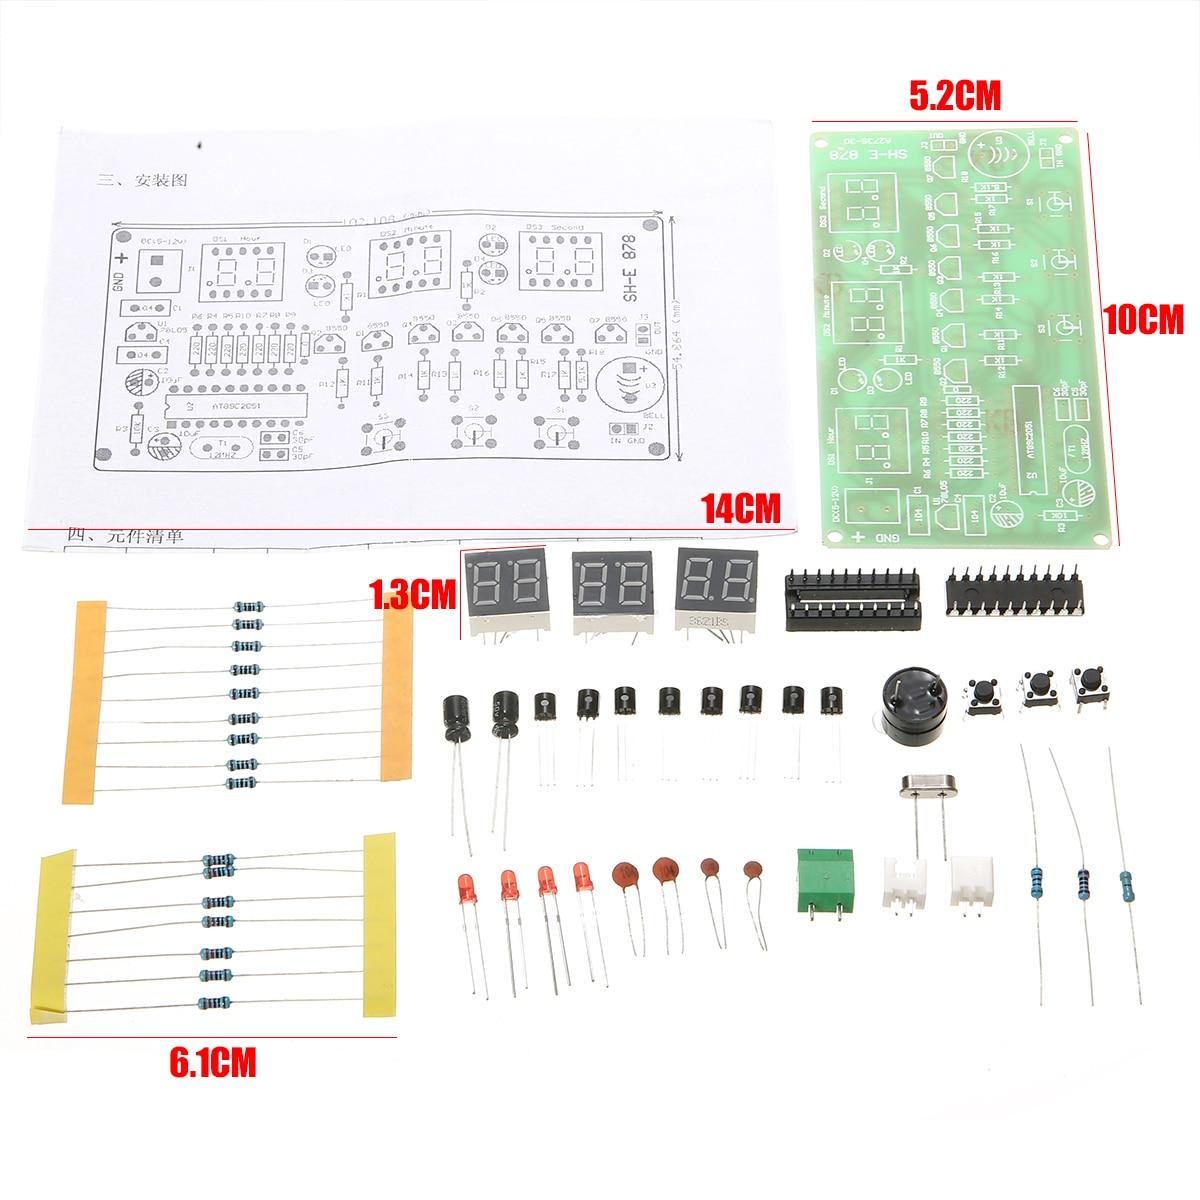 LED Electronic Clock Kit 5-12V 6 Digit LED Digital Electronics Clock Counter AT89C2051 DIY Kit Counter Alarm Timer 10cm*5.2cm